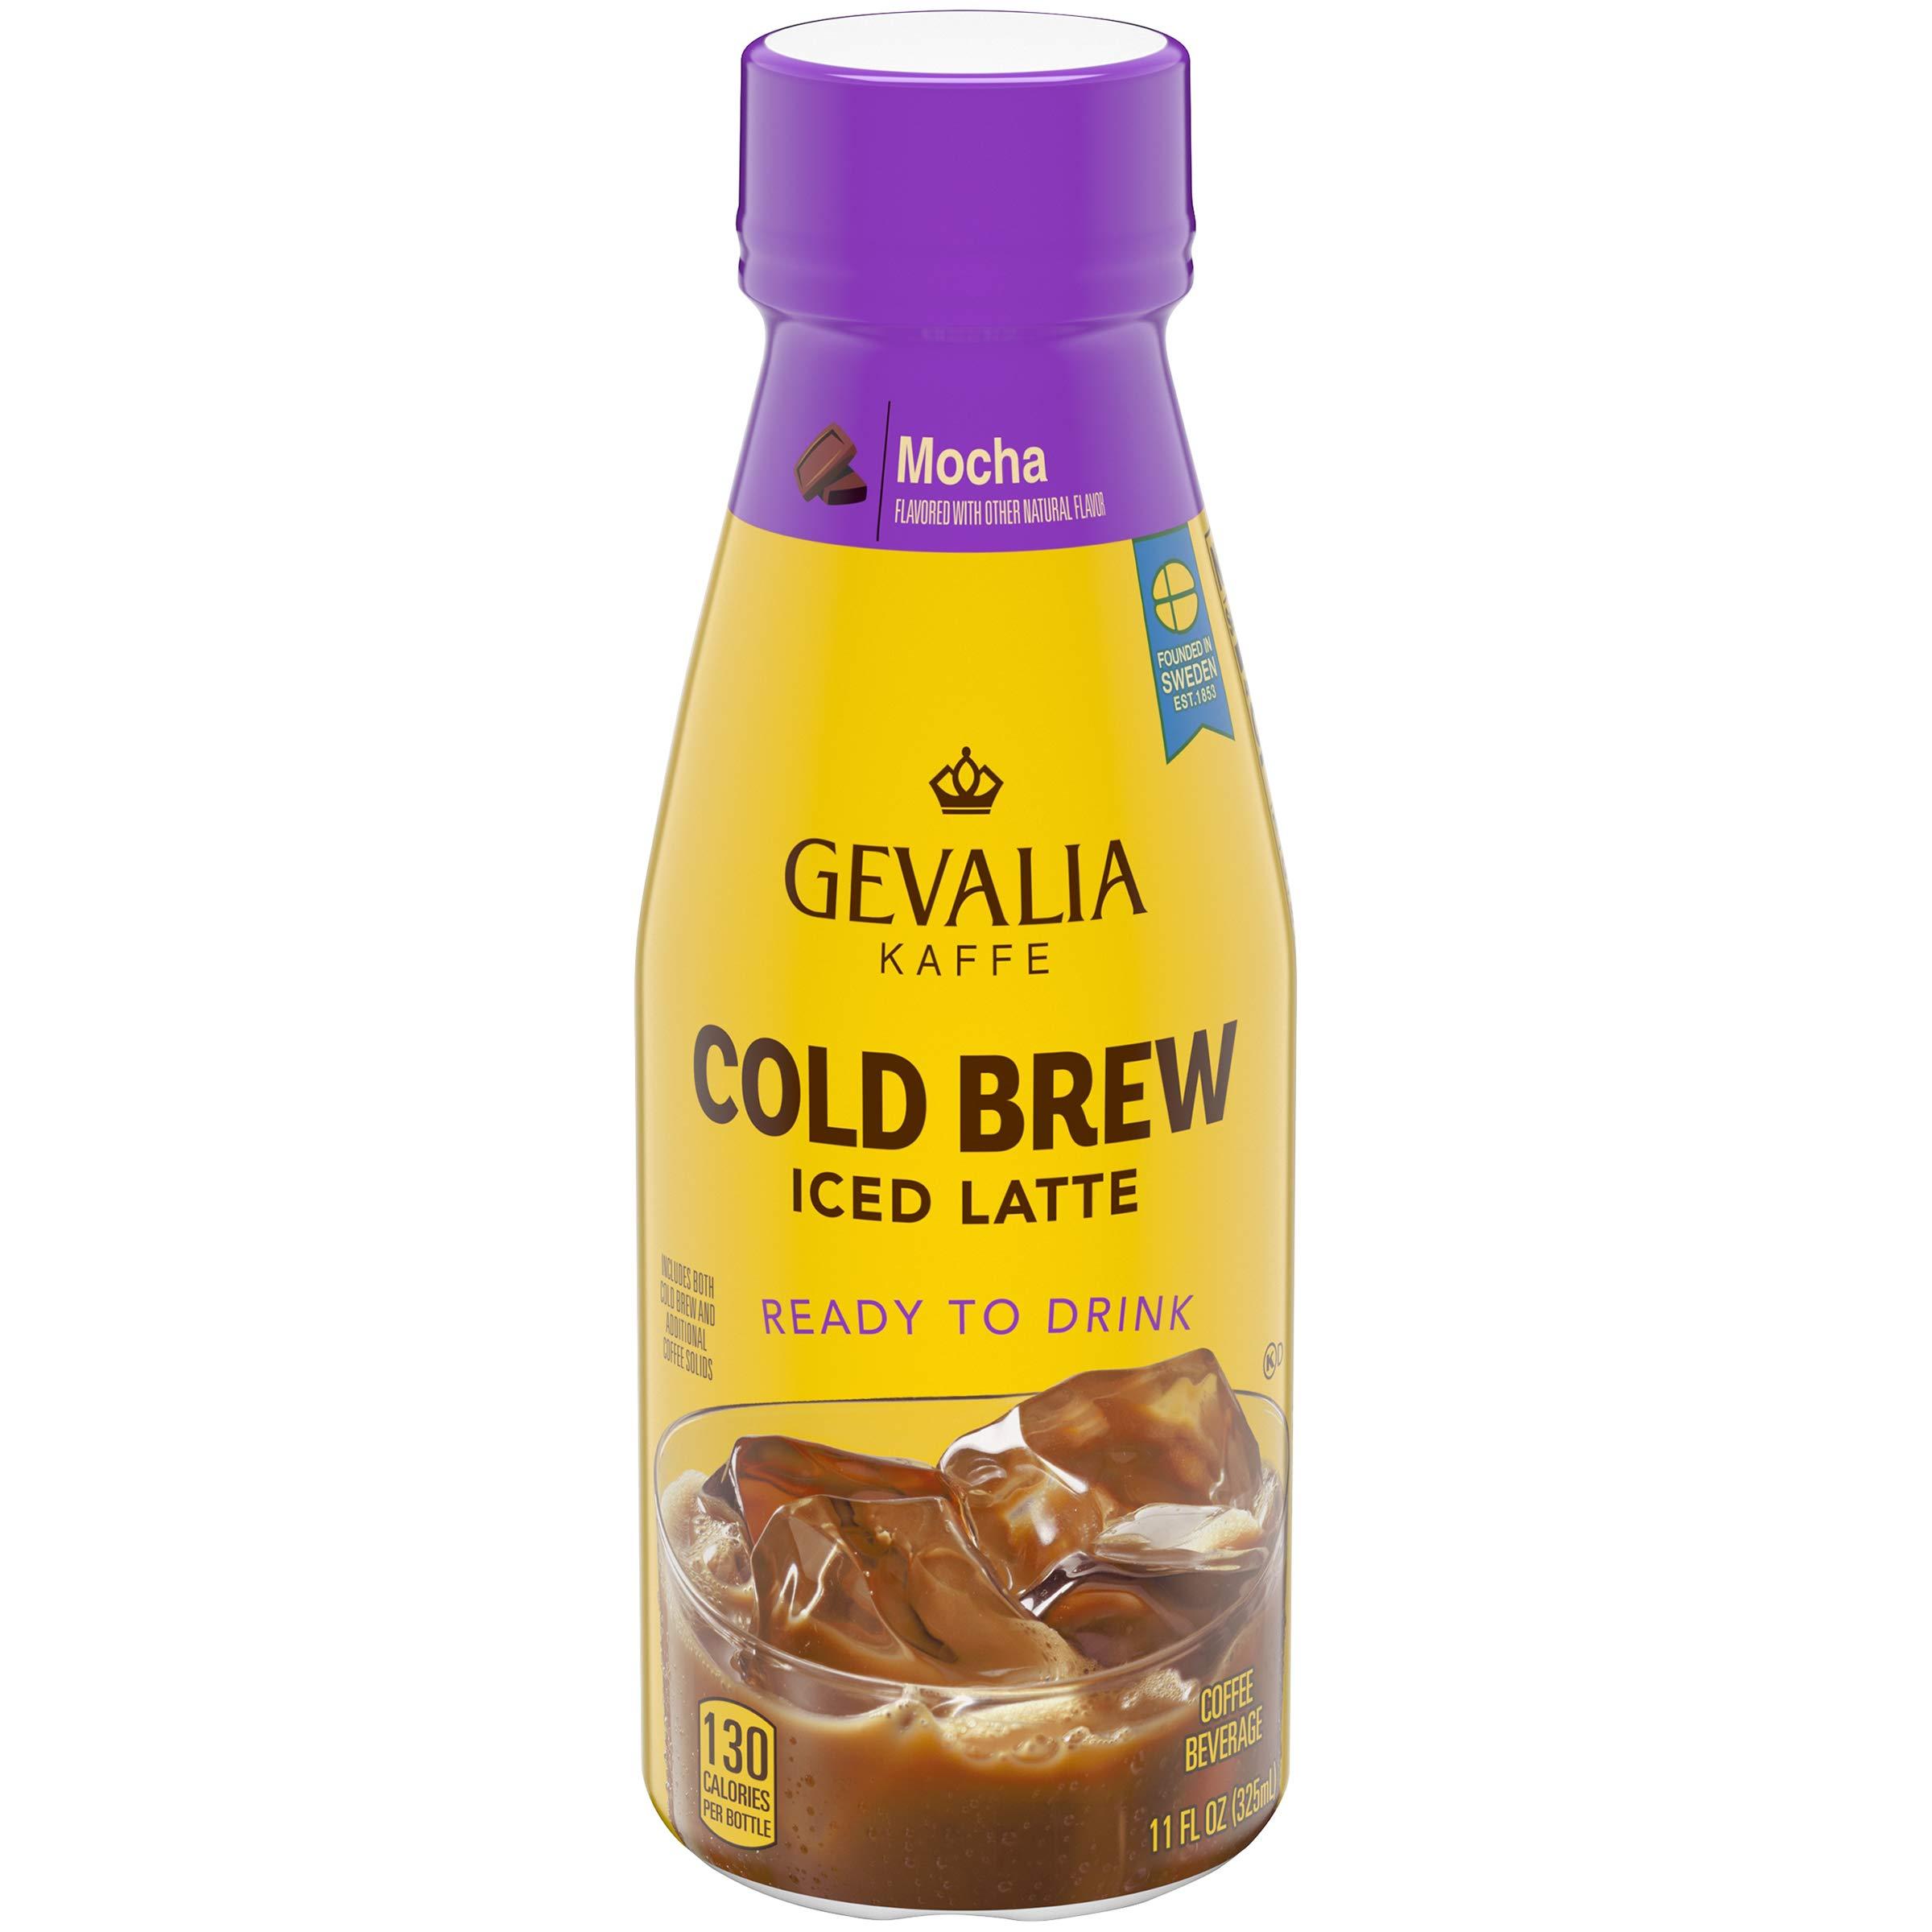 Gevalia Mocha Iced Latte Cold Brew Iced Coffee, 11 Fl oz Bottle (Pack of 12)